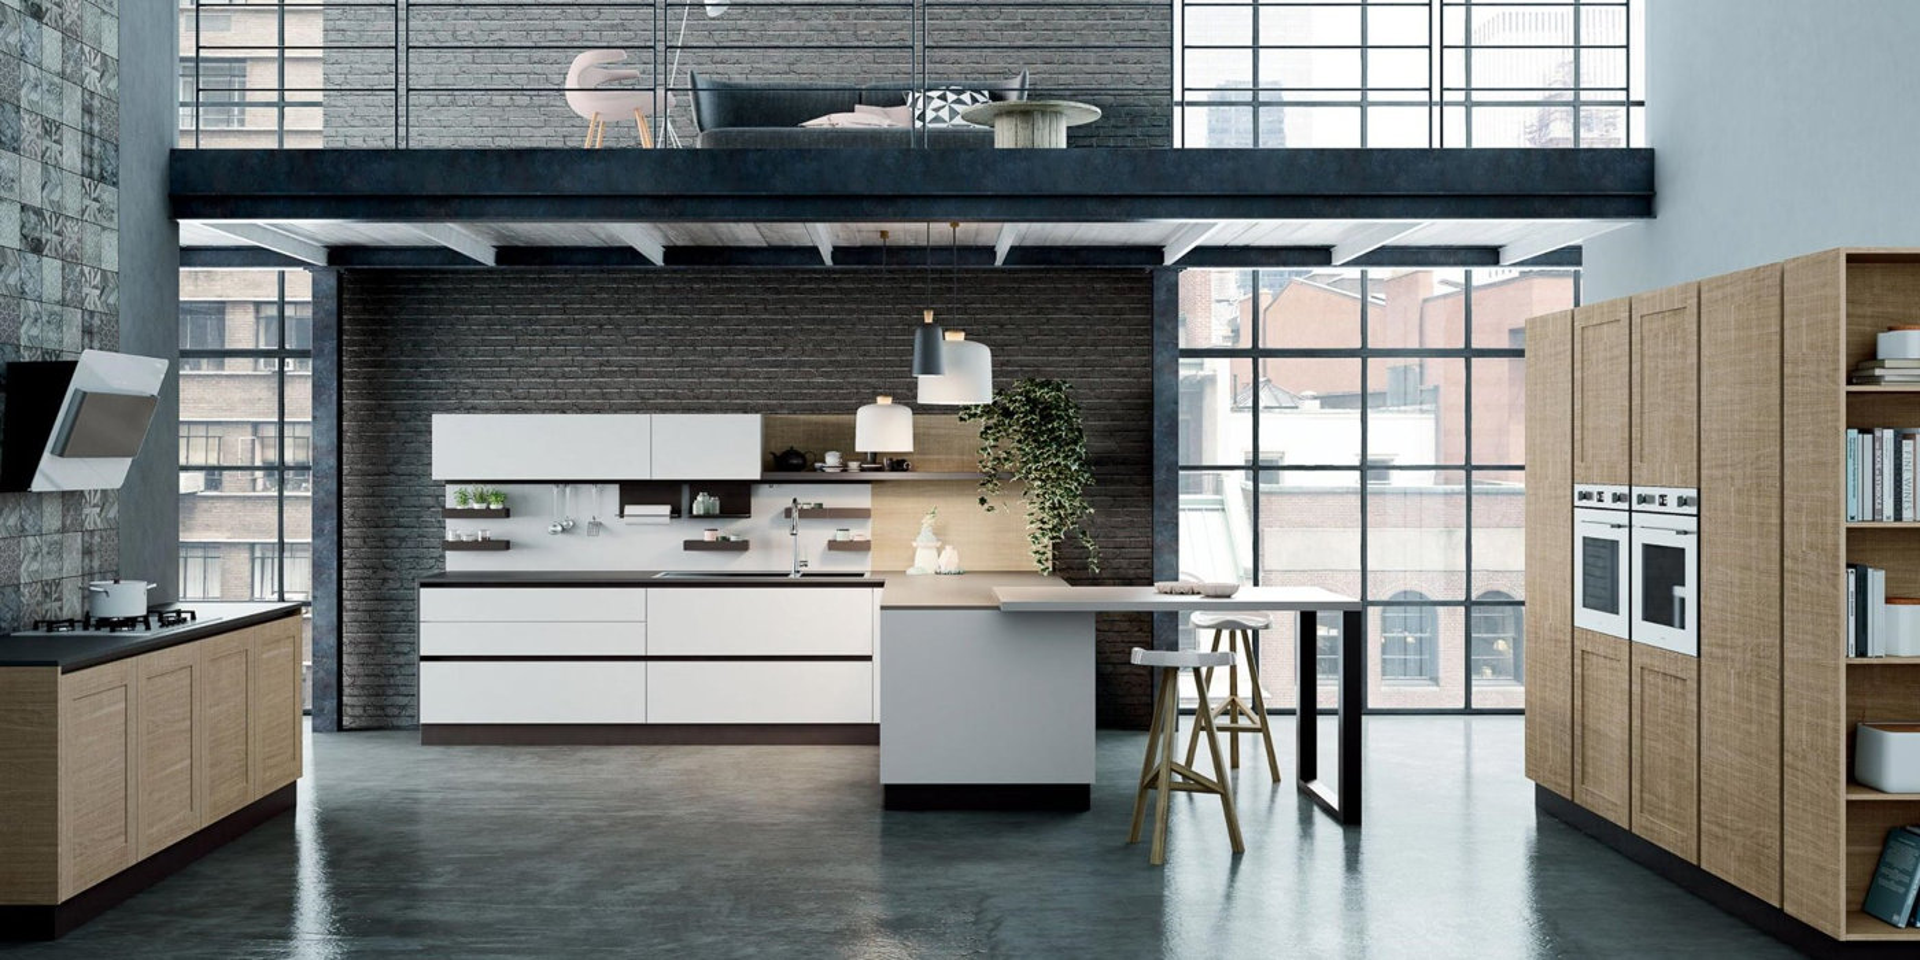 Fabbrica cucine brescia good cucine componibili snaidero cucina moderna bianca e marrone - Fabbrica cucine componibili economiche ...